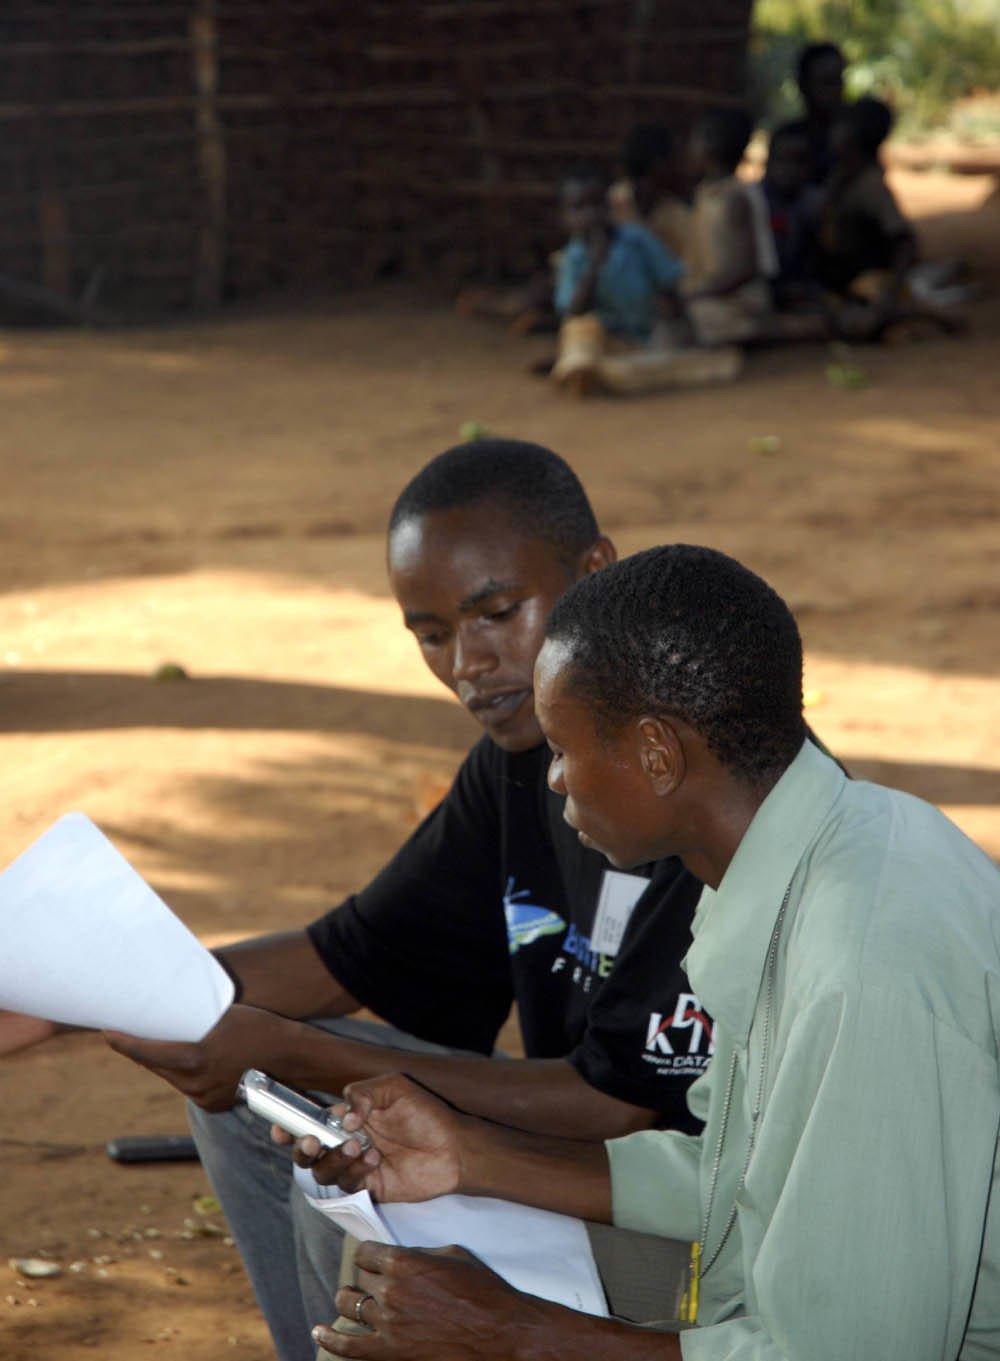 Two men complete fieldwork using a cellphone in Kenya. Image: Flickr/Nathan Eagle/Kiwanja.net